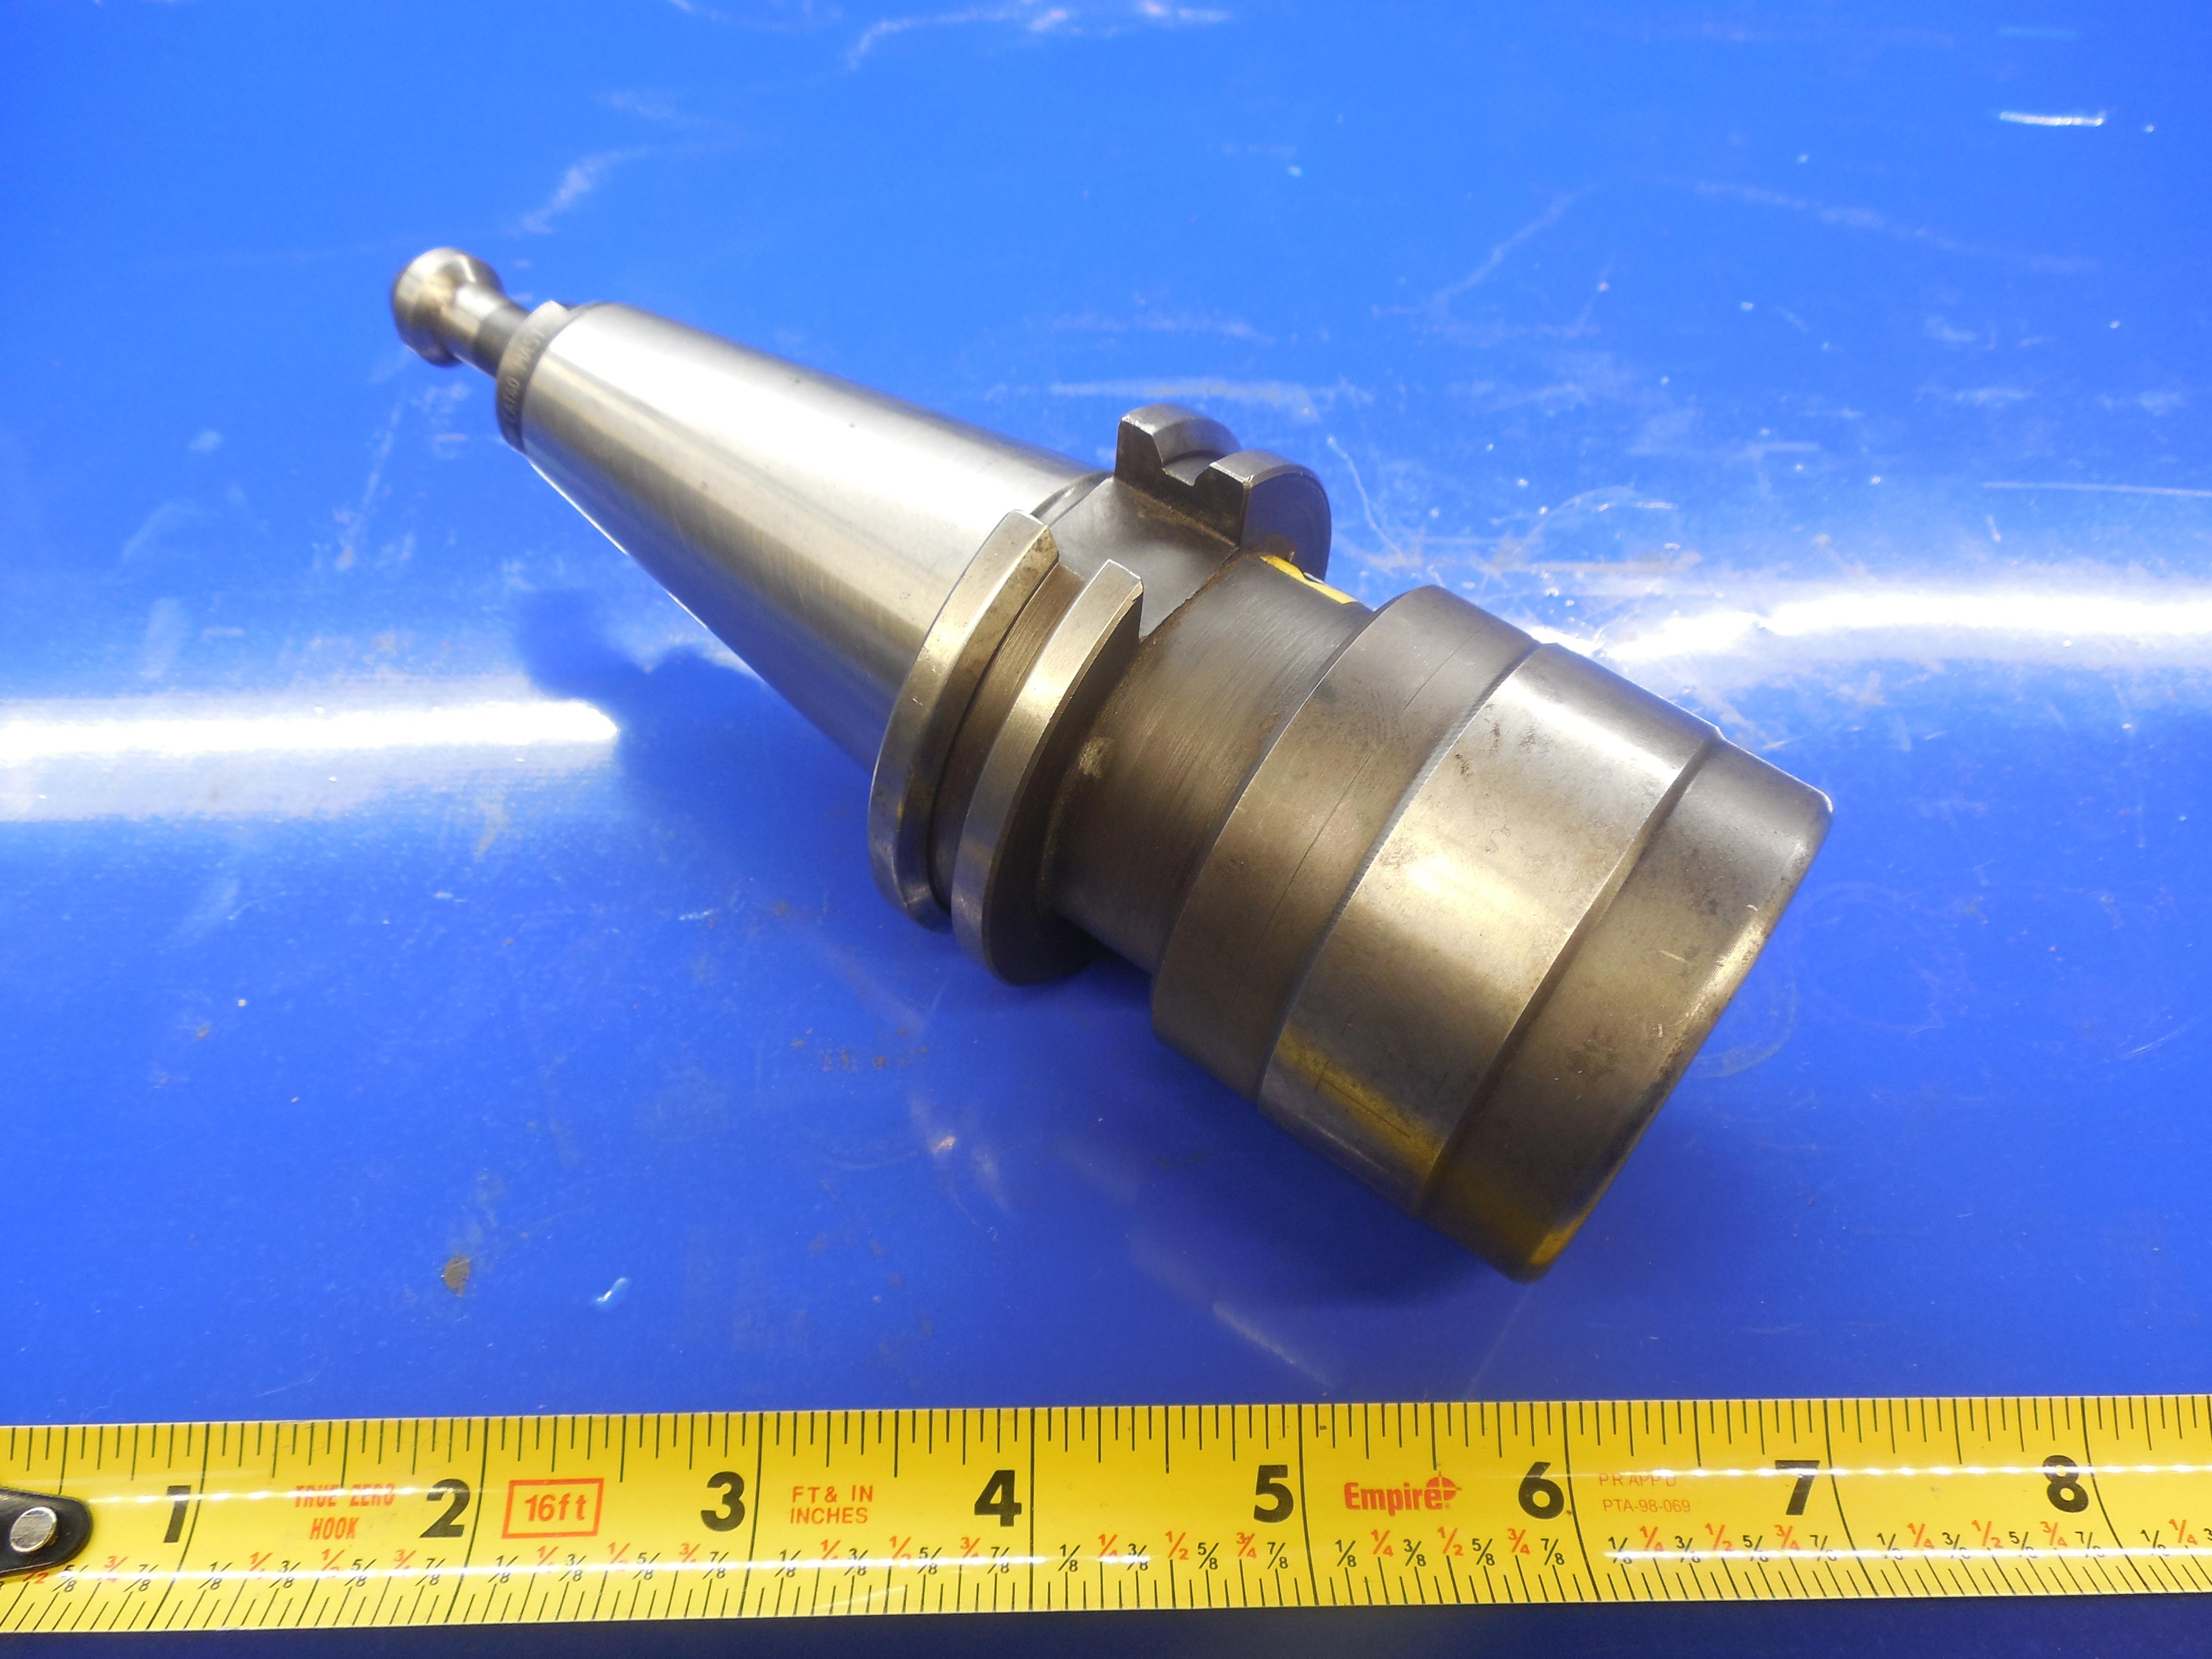 PHILIPS MRS25 464K 0.6W 1/% 350V Metal Film Resistor Non-RoHS 10pcs